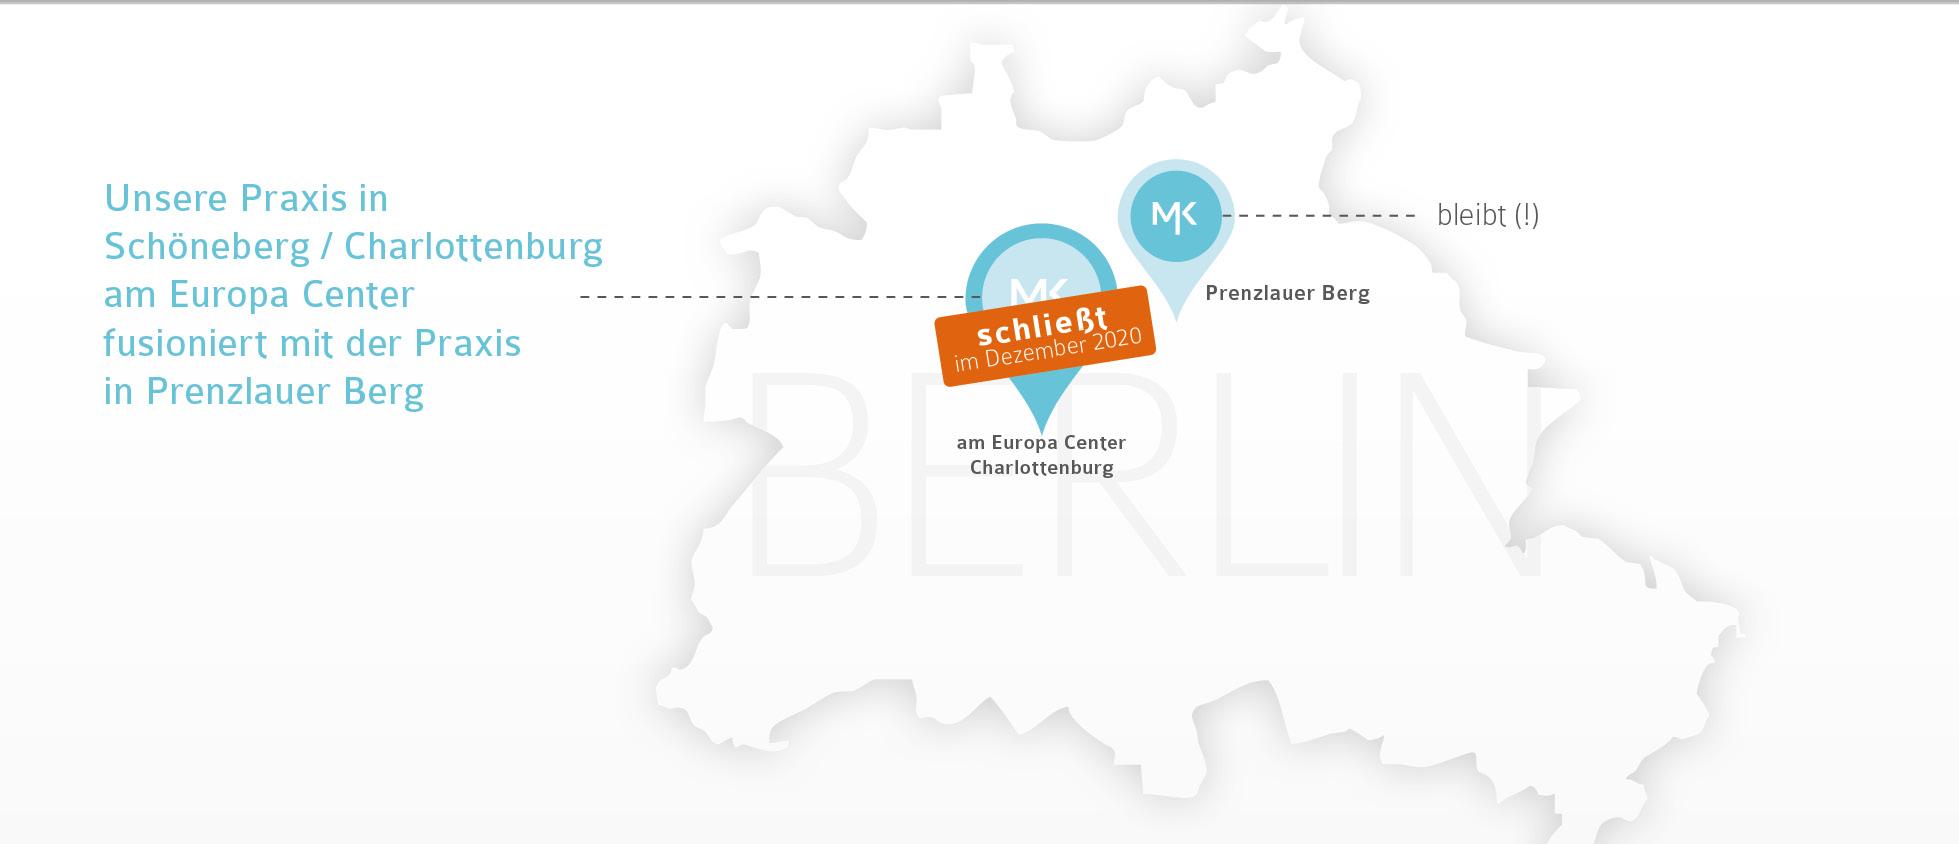 kretschmar-dent-charlottenburg-fusioniert